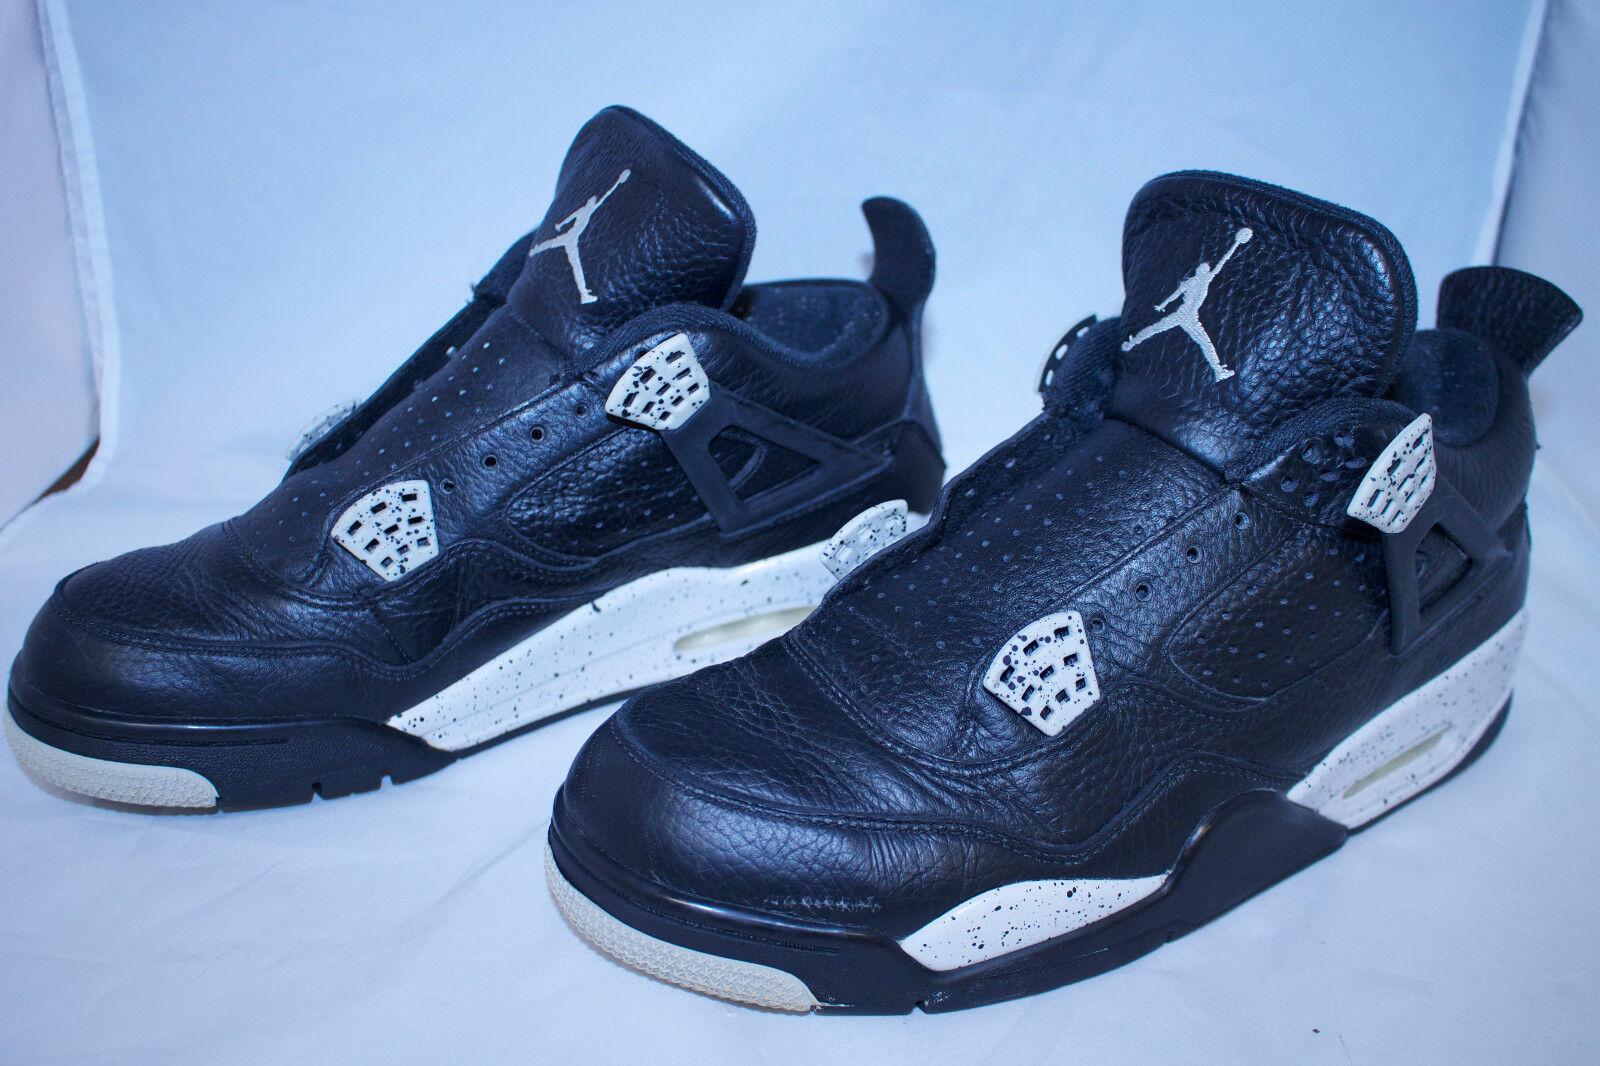 Nike Air Jordan 4 Retro LS Men's Tennis Shoes Comfortable Seasonal clearance sale